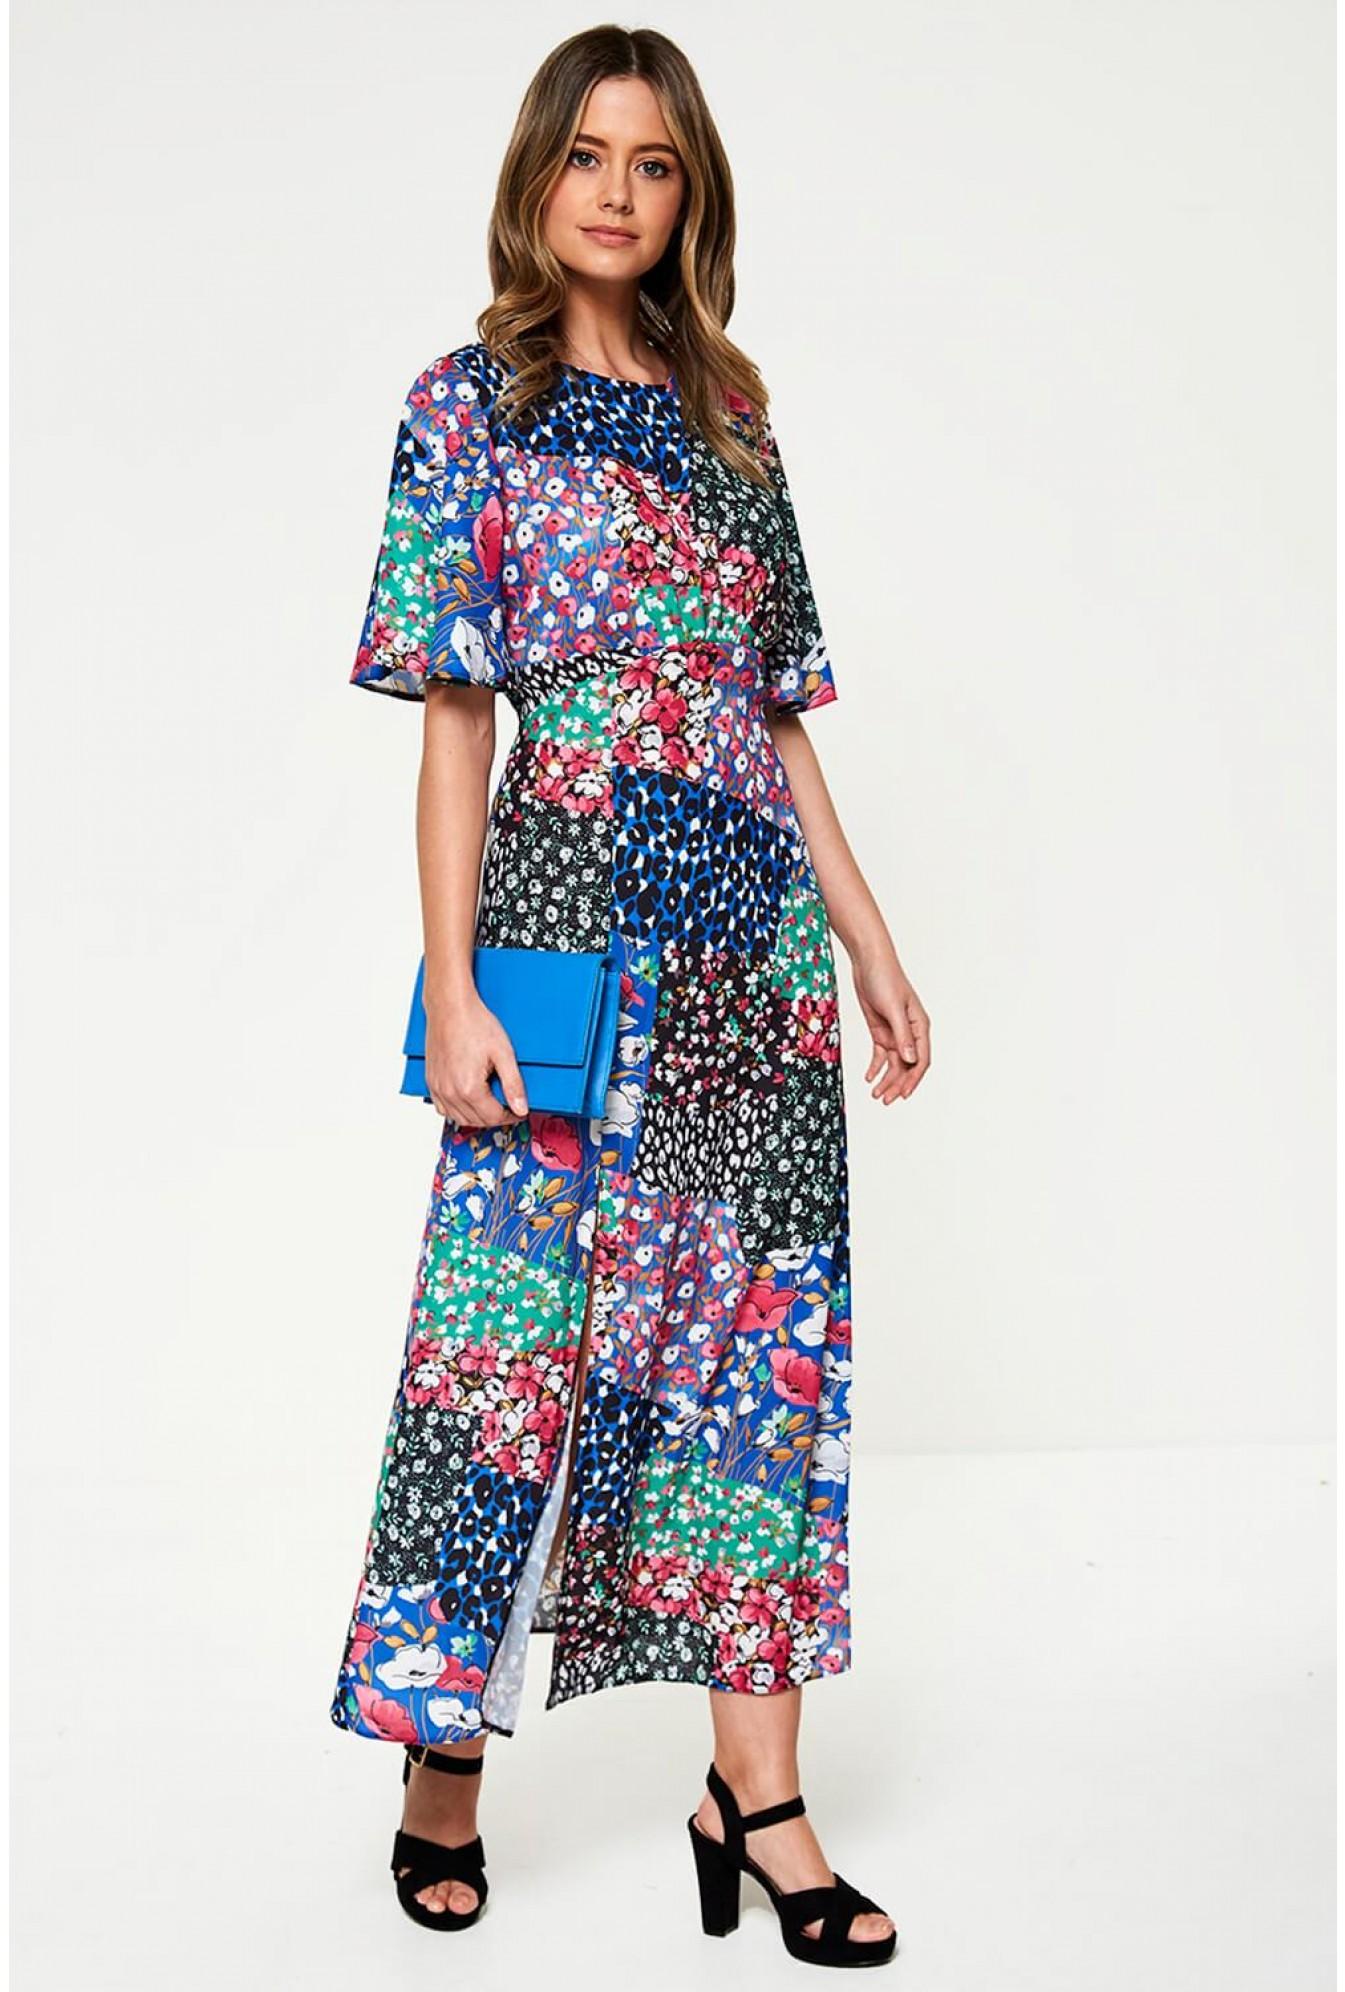 475328b64c More Views. Maxi Tea Dress in Patchwork Print